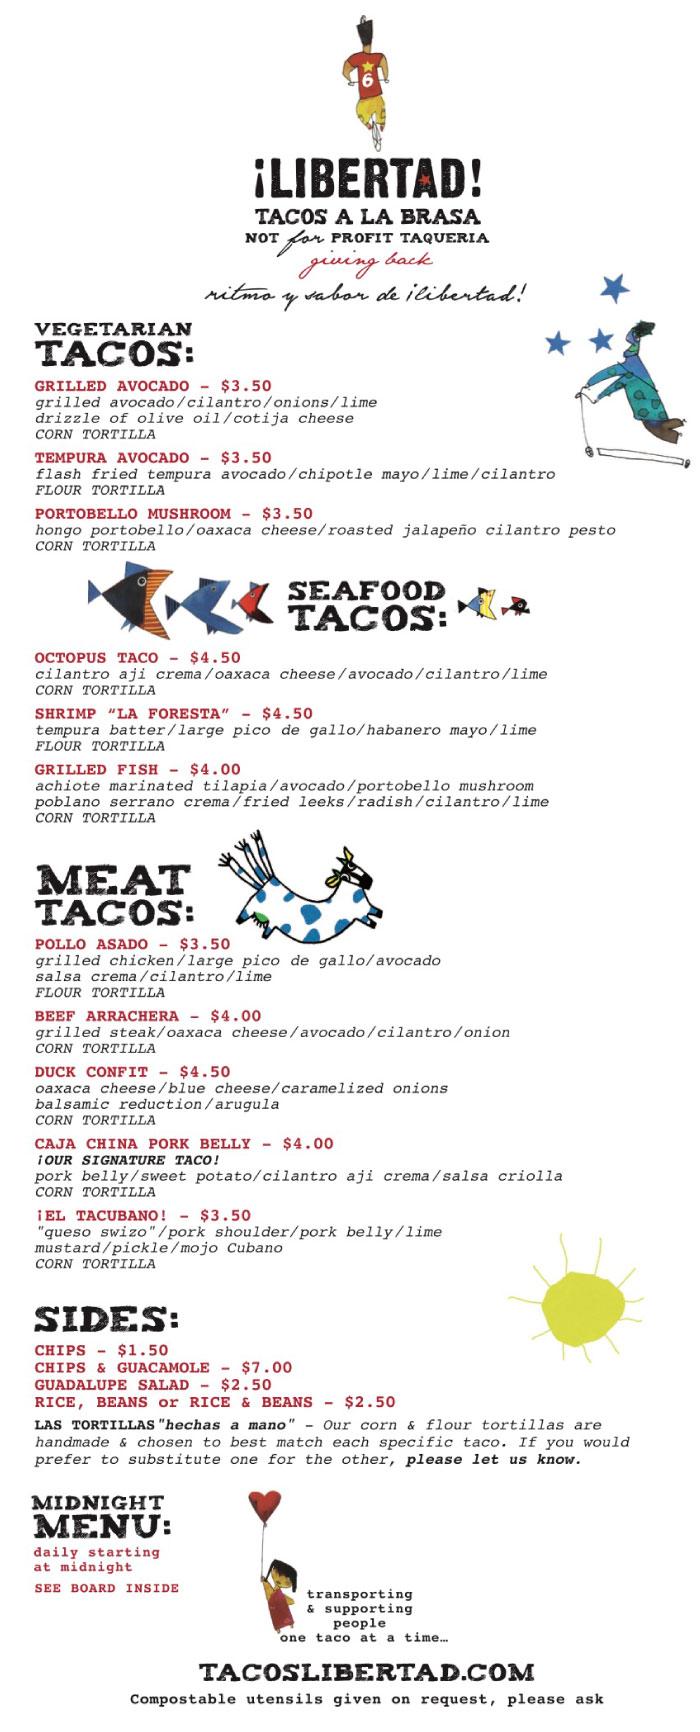 Libertad Tacos de la Brasa - Check Out Our Menu! - Cohn Restaurant Group